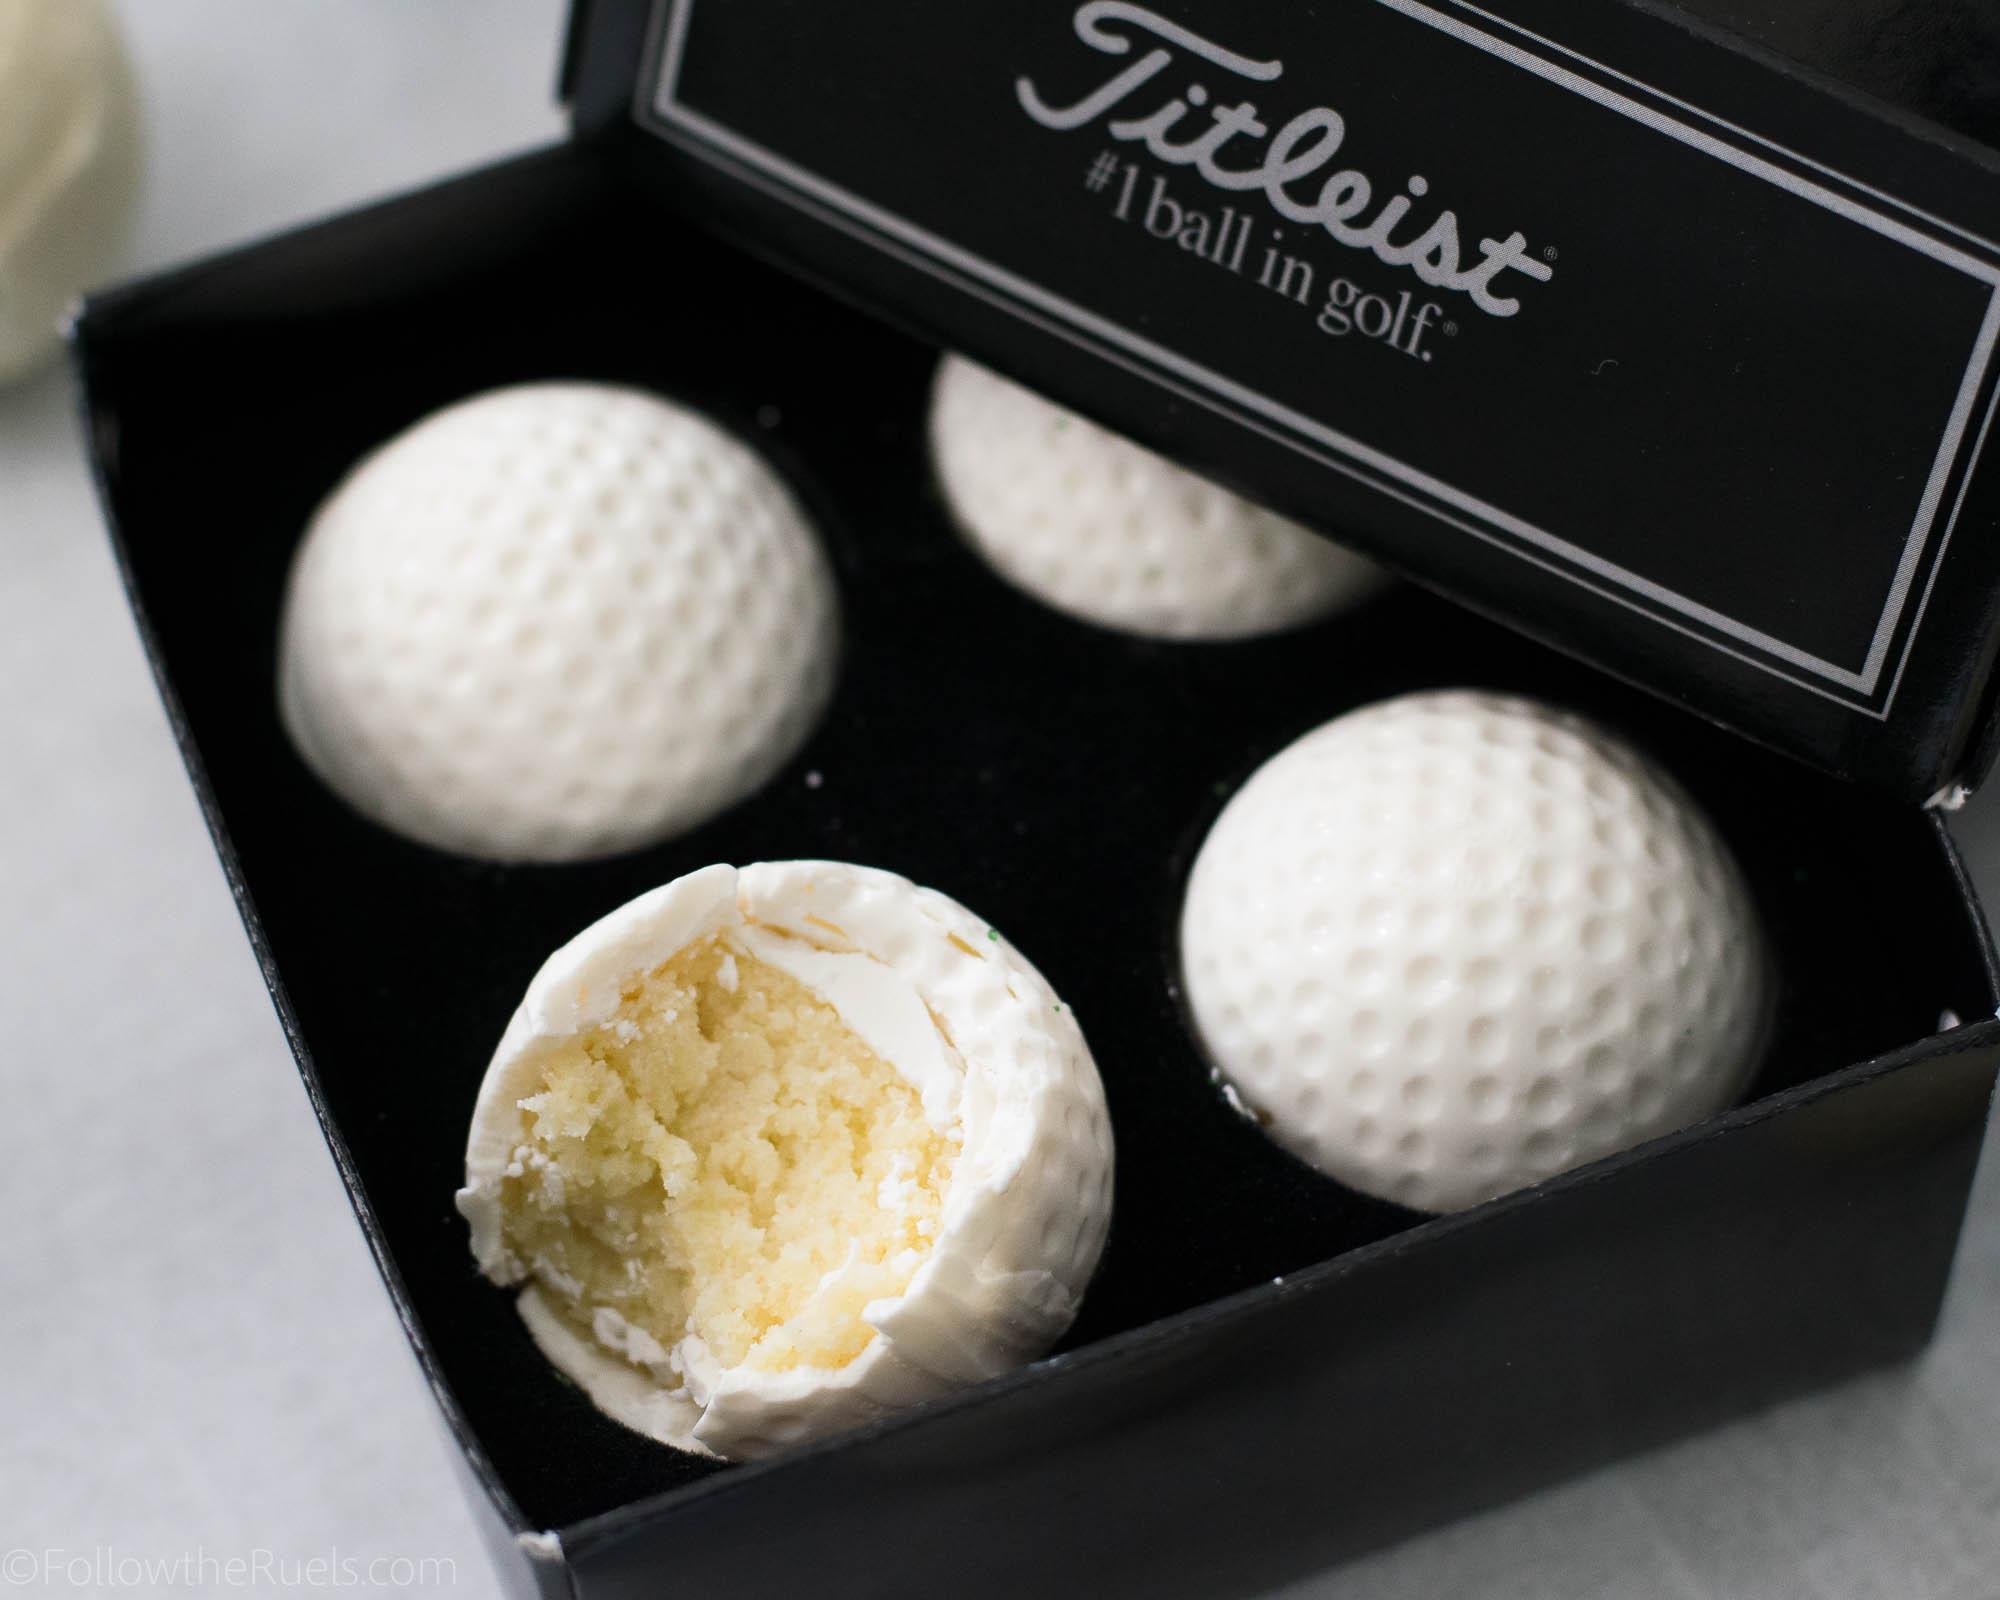 Golf-Cake-Balls-8.jpg